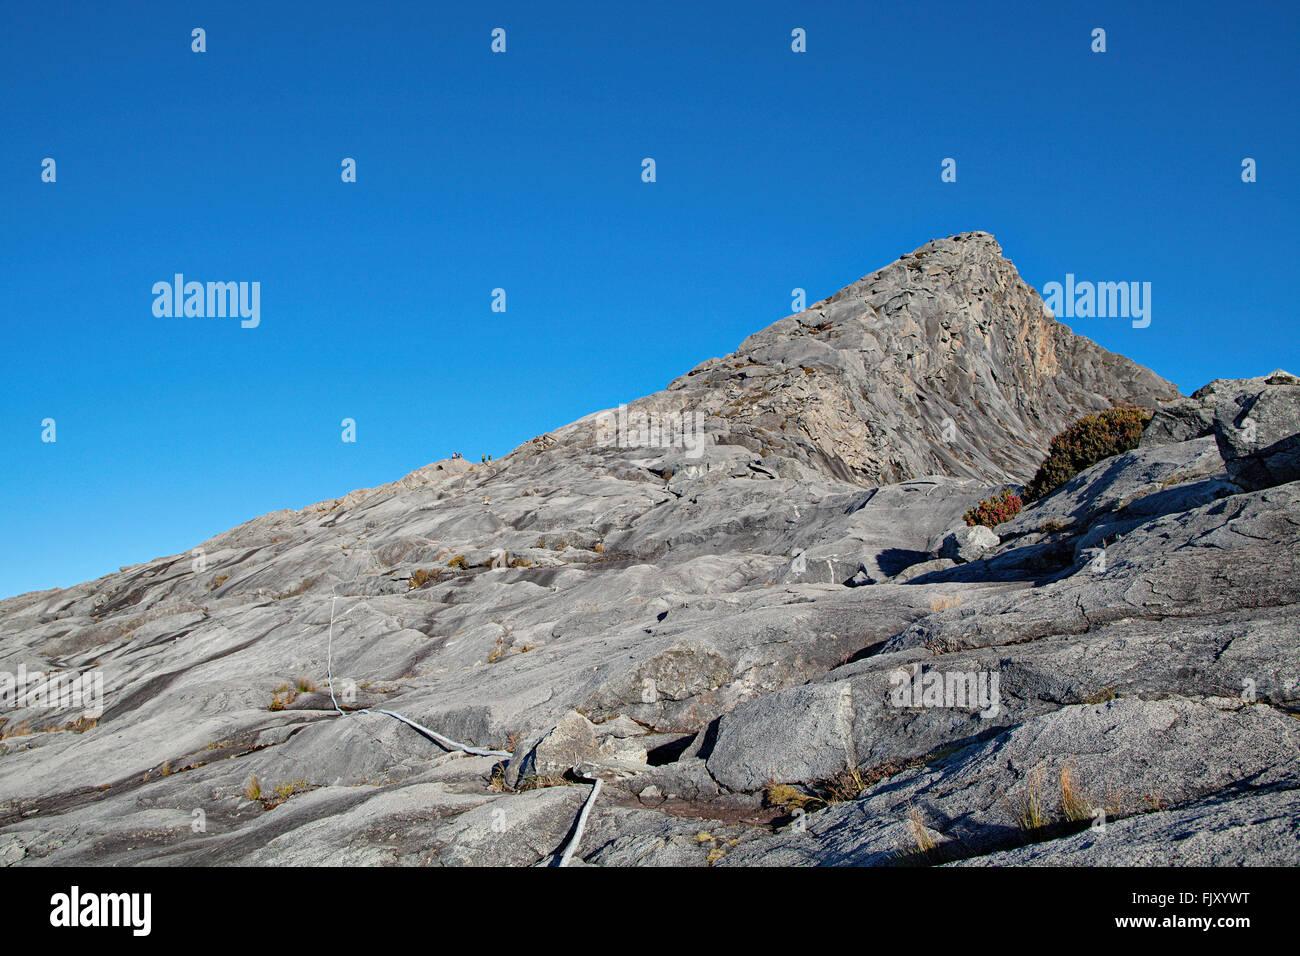 Peak of Mount Kinabalu (4095m), the highest mountain of Borneo. - Stock Image